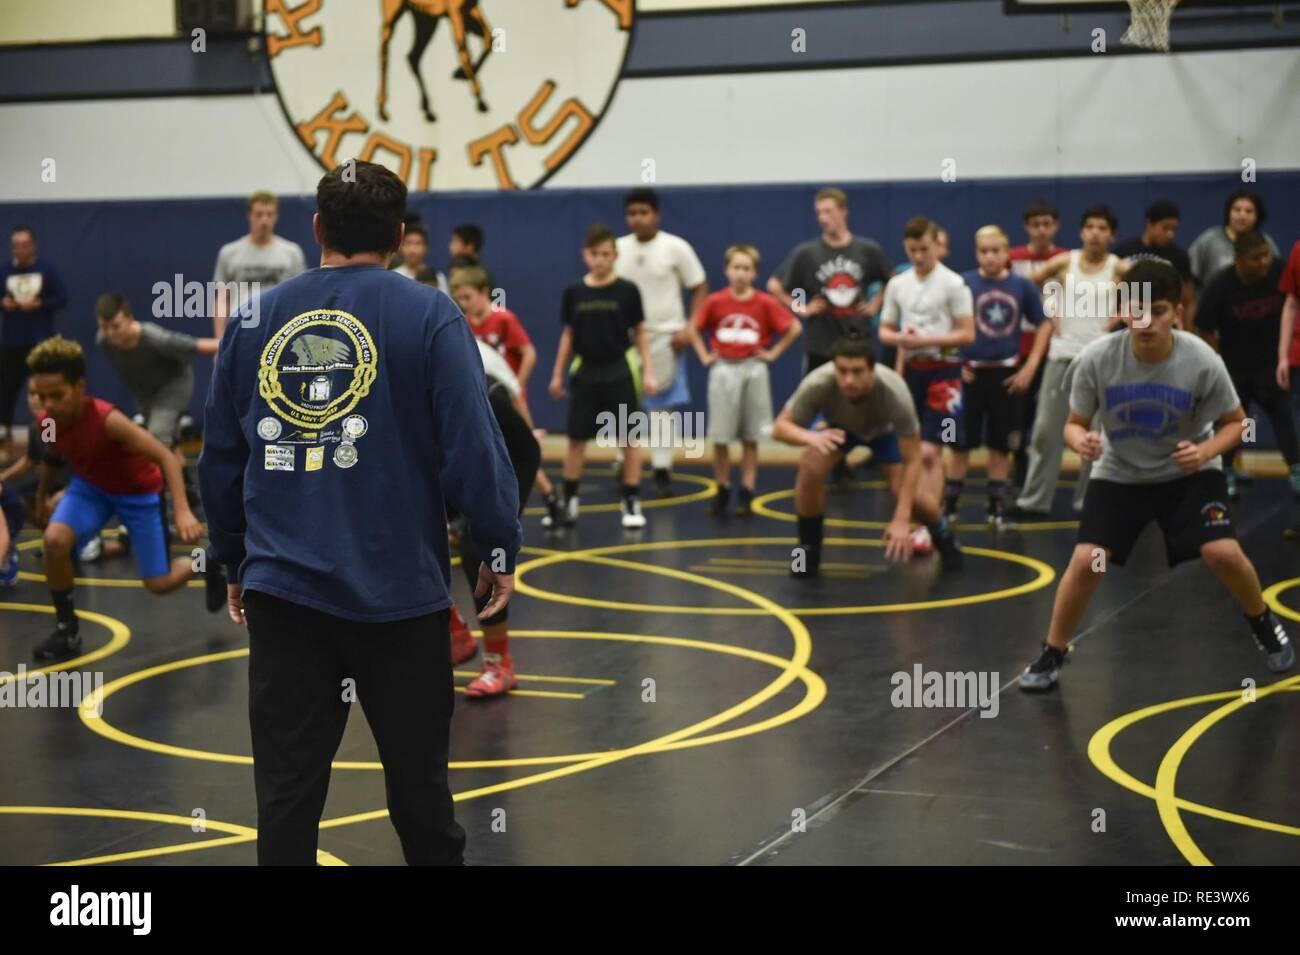 TACOMA, Wash  (Nov  18, 2016) All-Navy Wrestling head coach